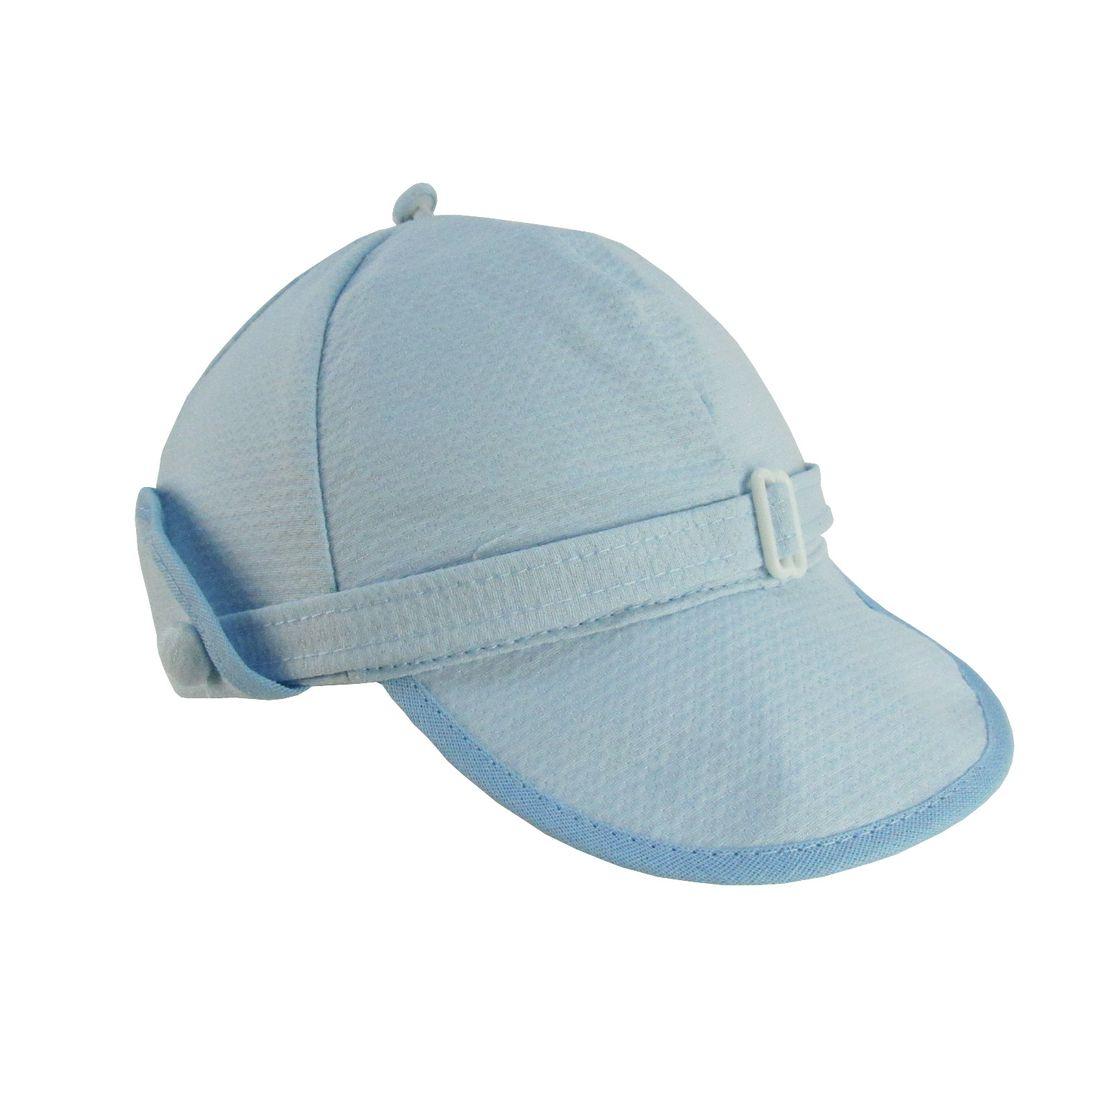 Boné Bebê Masculino Azul Claro - poetique b88e6e3dd16